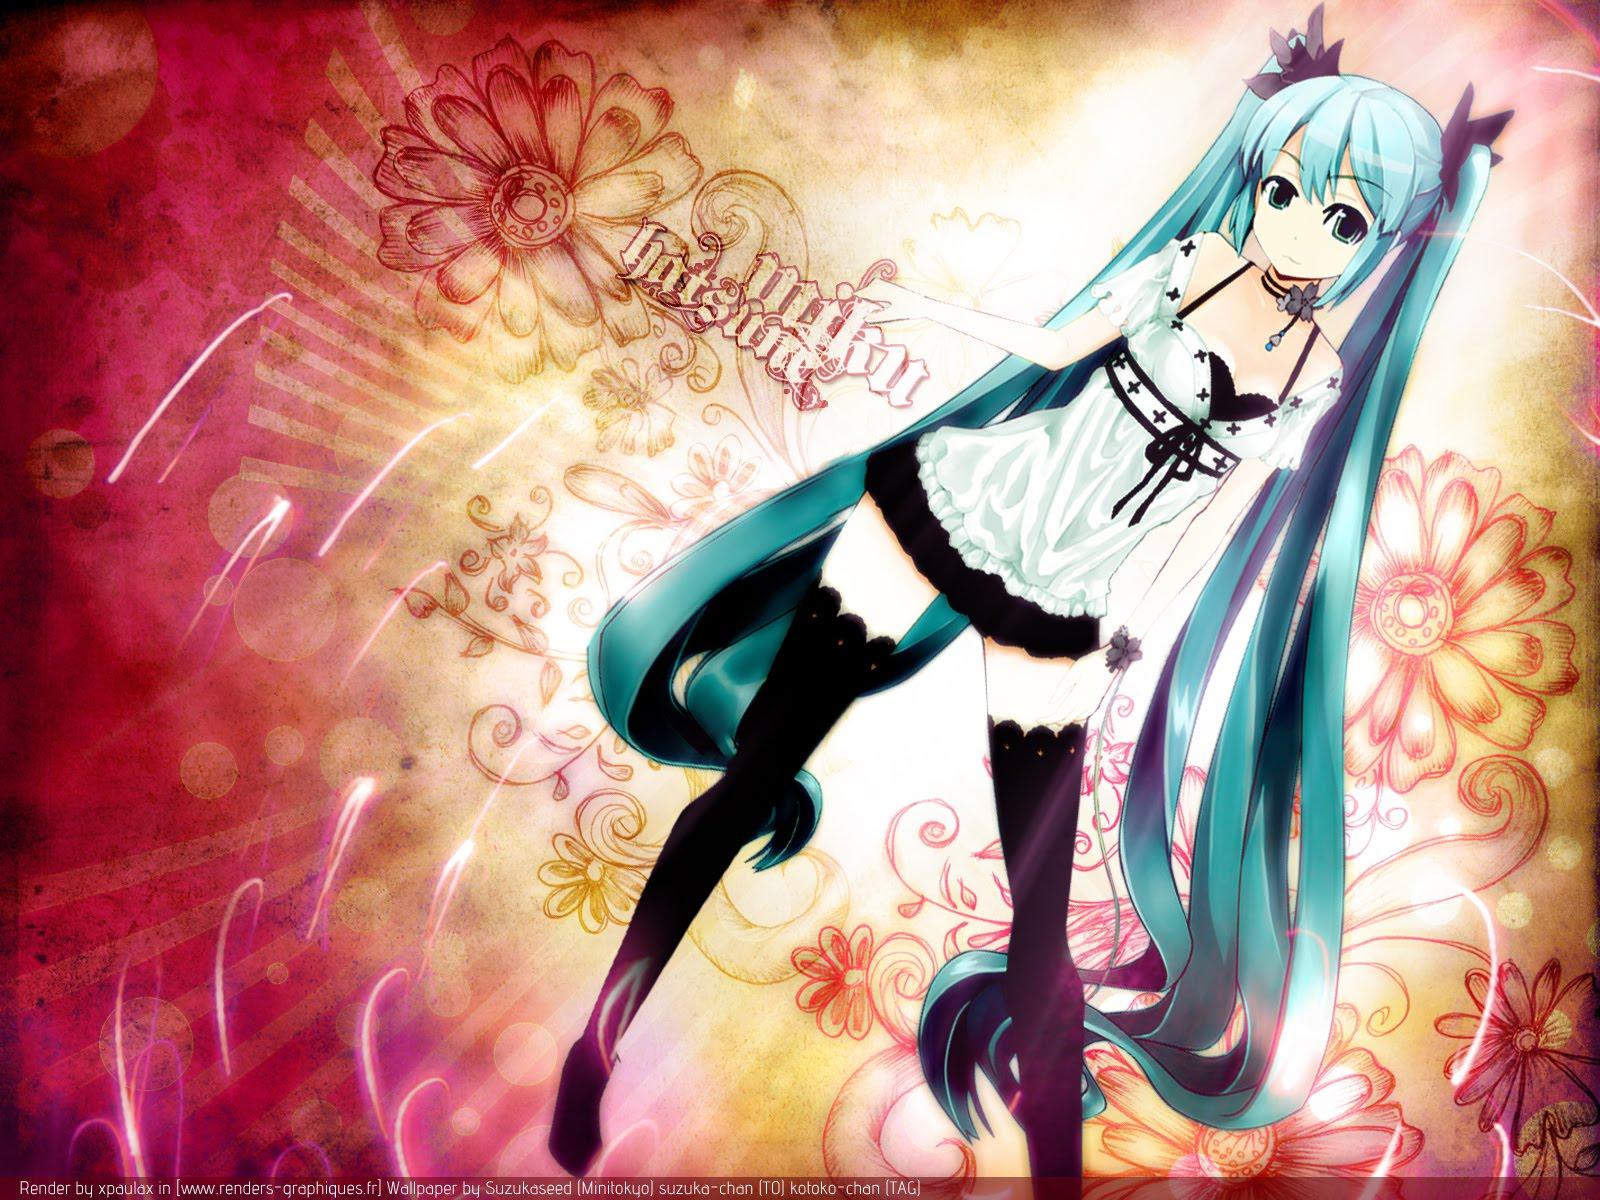 http://3.bp.blogspot.com/_TM0Qm0a6wgE/S638xFfTsXI/AAAAAAAACo4/4SHTBhfFkoU/s1600/Minitokyo.Vocaloid.Wallpapers_452171.jpg